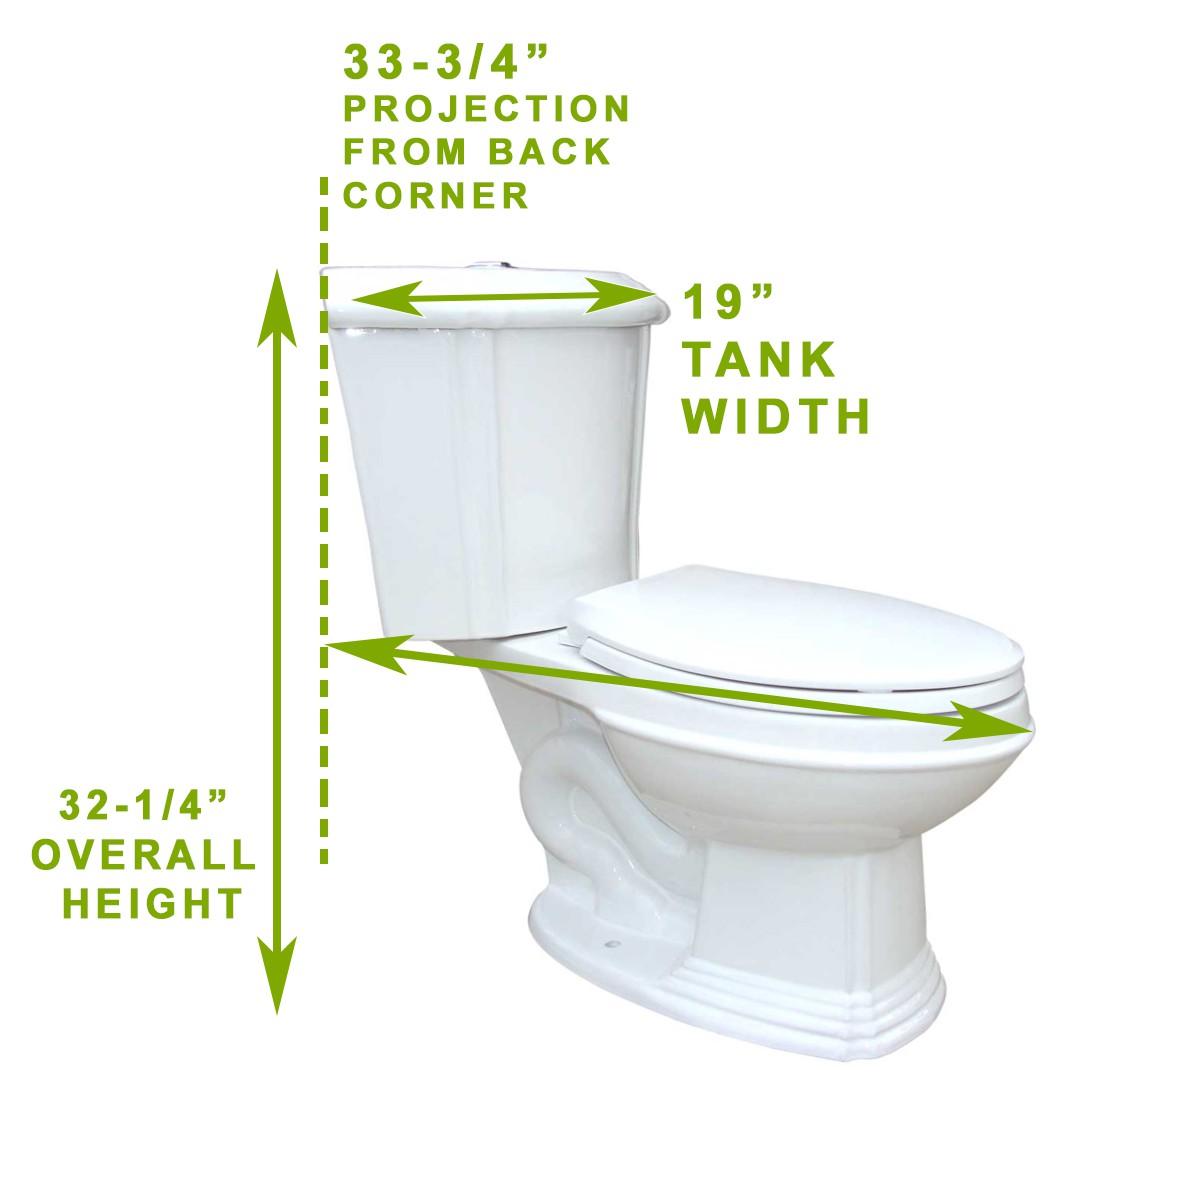 spec  PRE White Porcelain Elongated Space Saving Corner Toilet. Corner Toilet Tank   Small Corner Toilet   Renovator s Supply